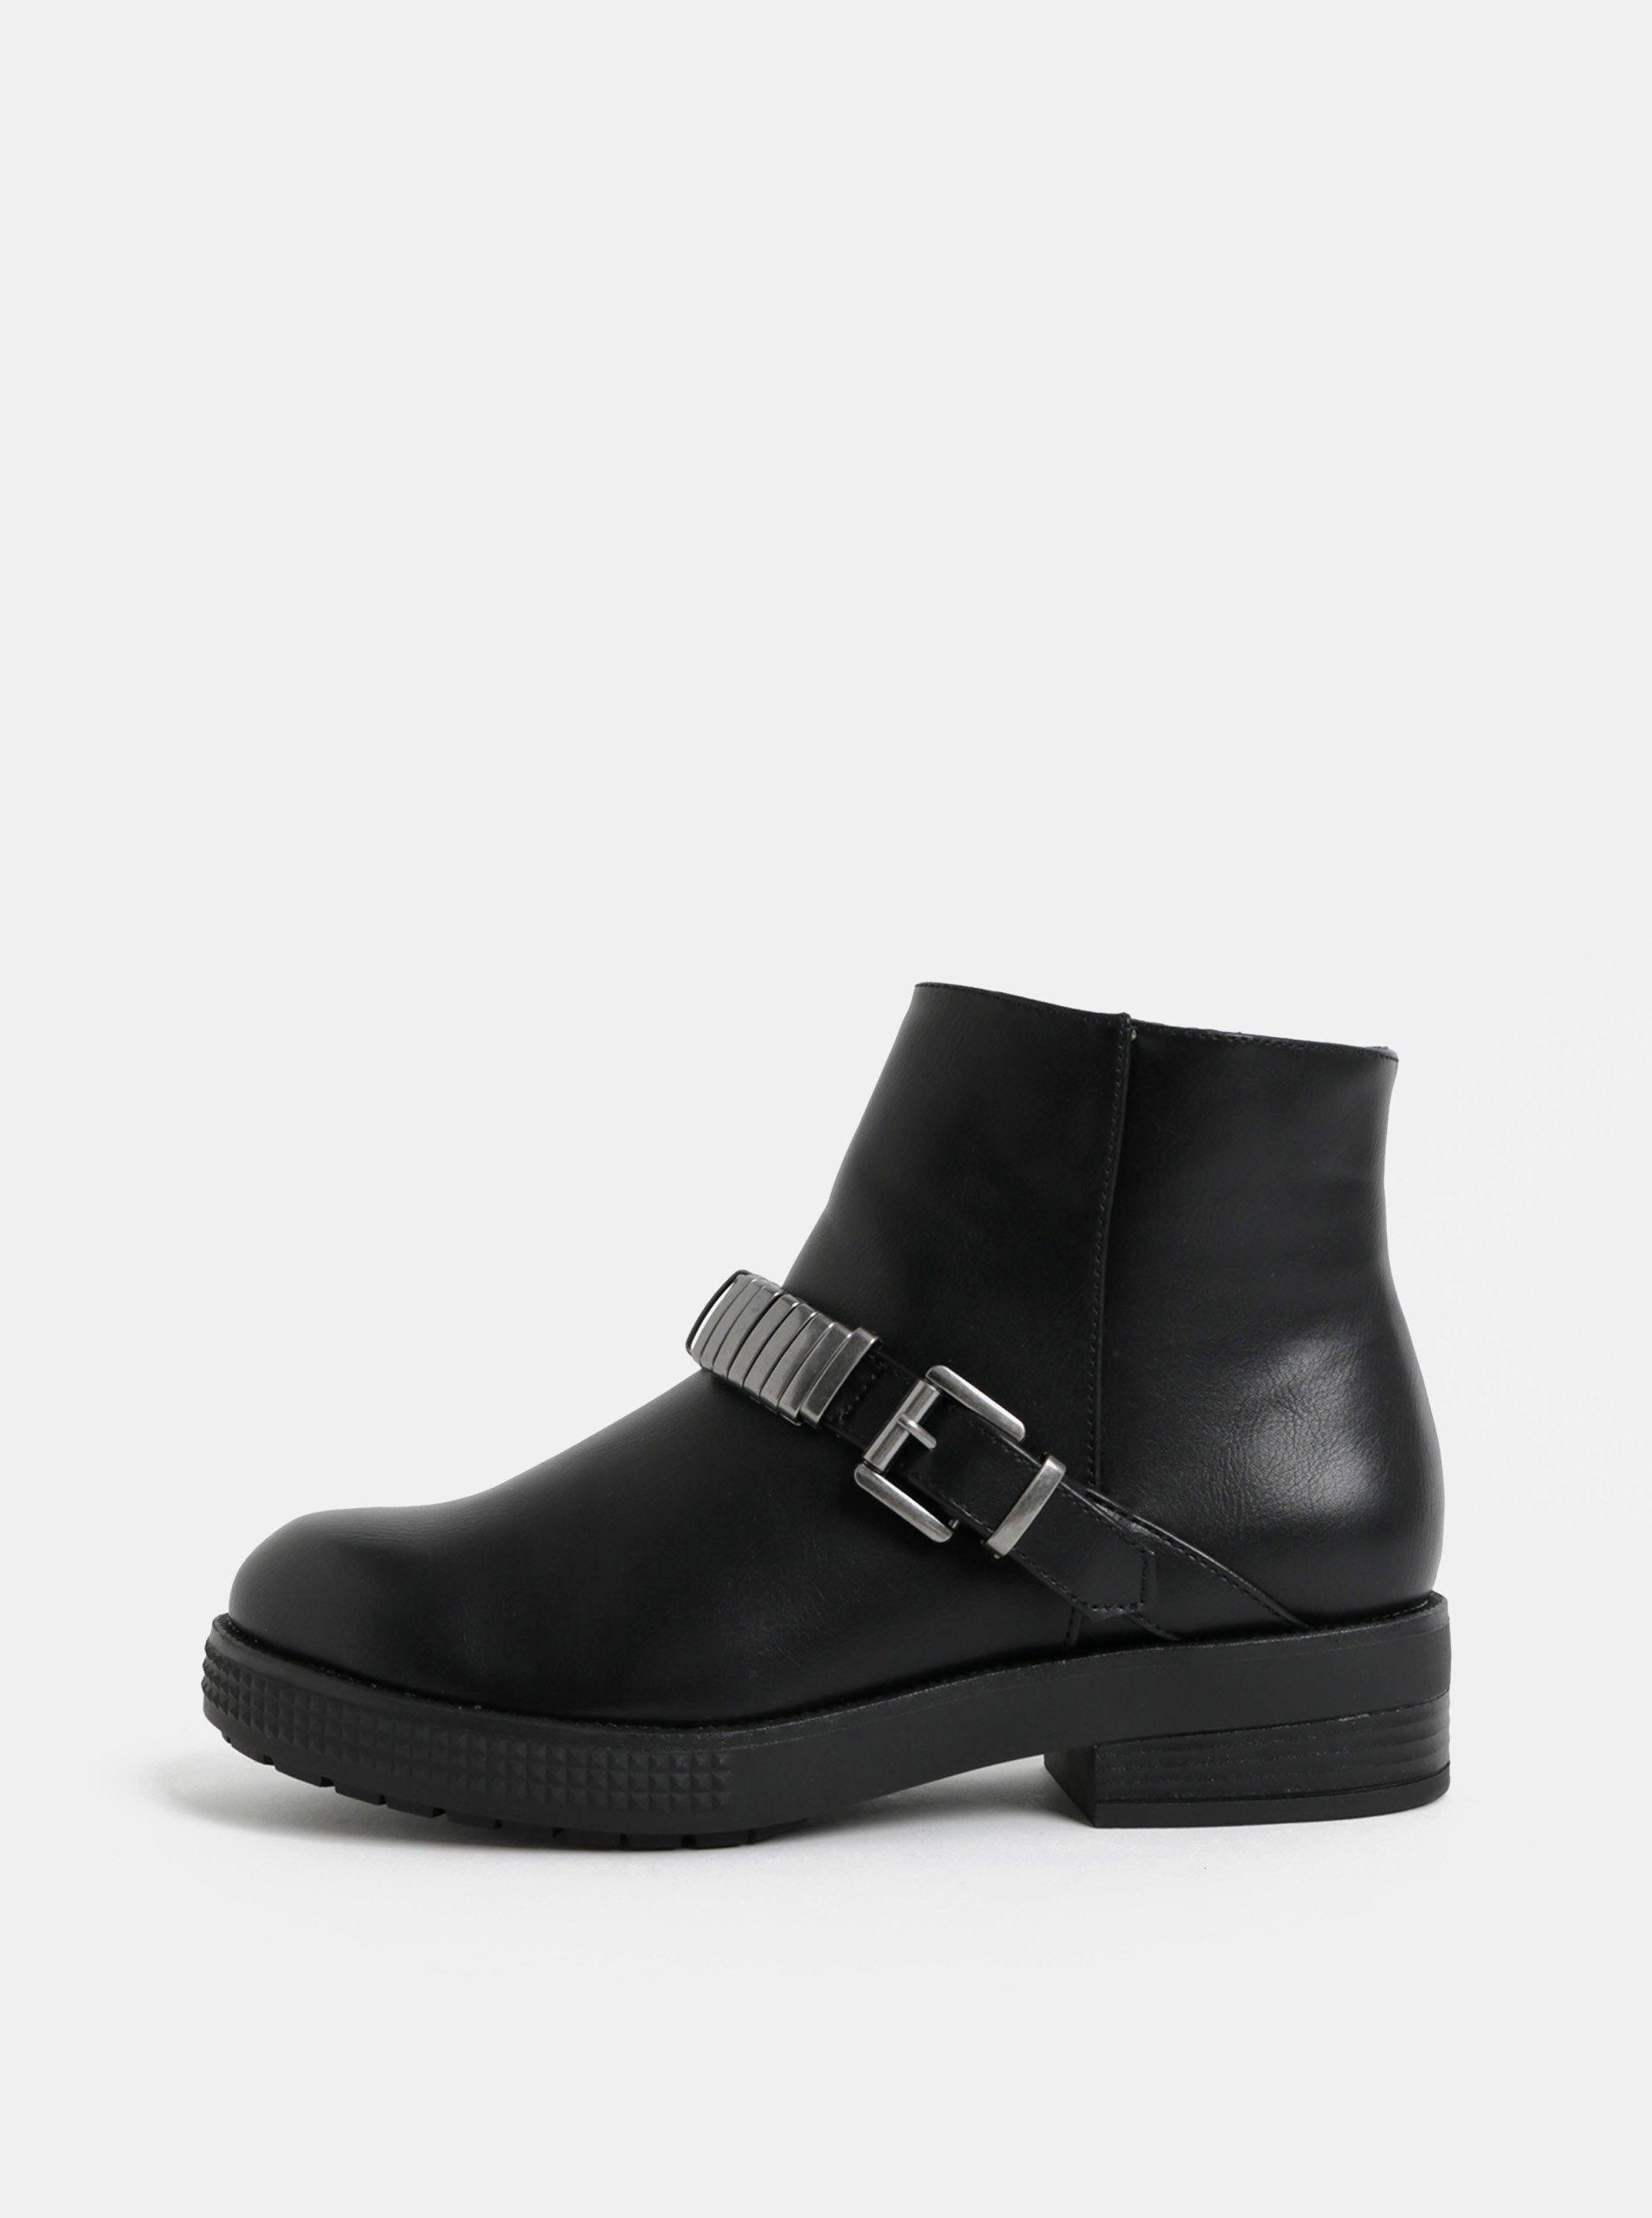 Damske kotnikove boty s protektorem cerne levně  eebe5f31f9